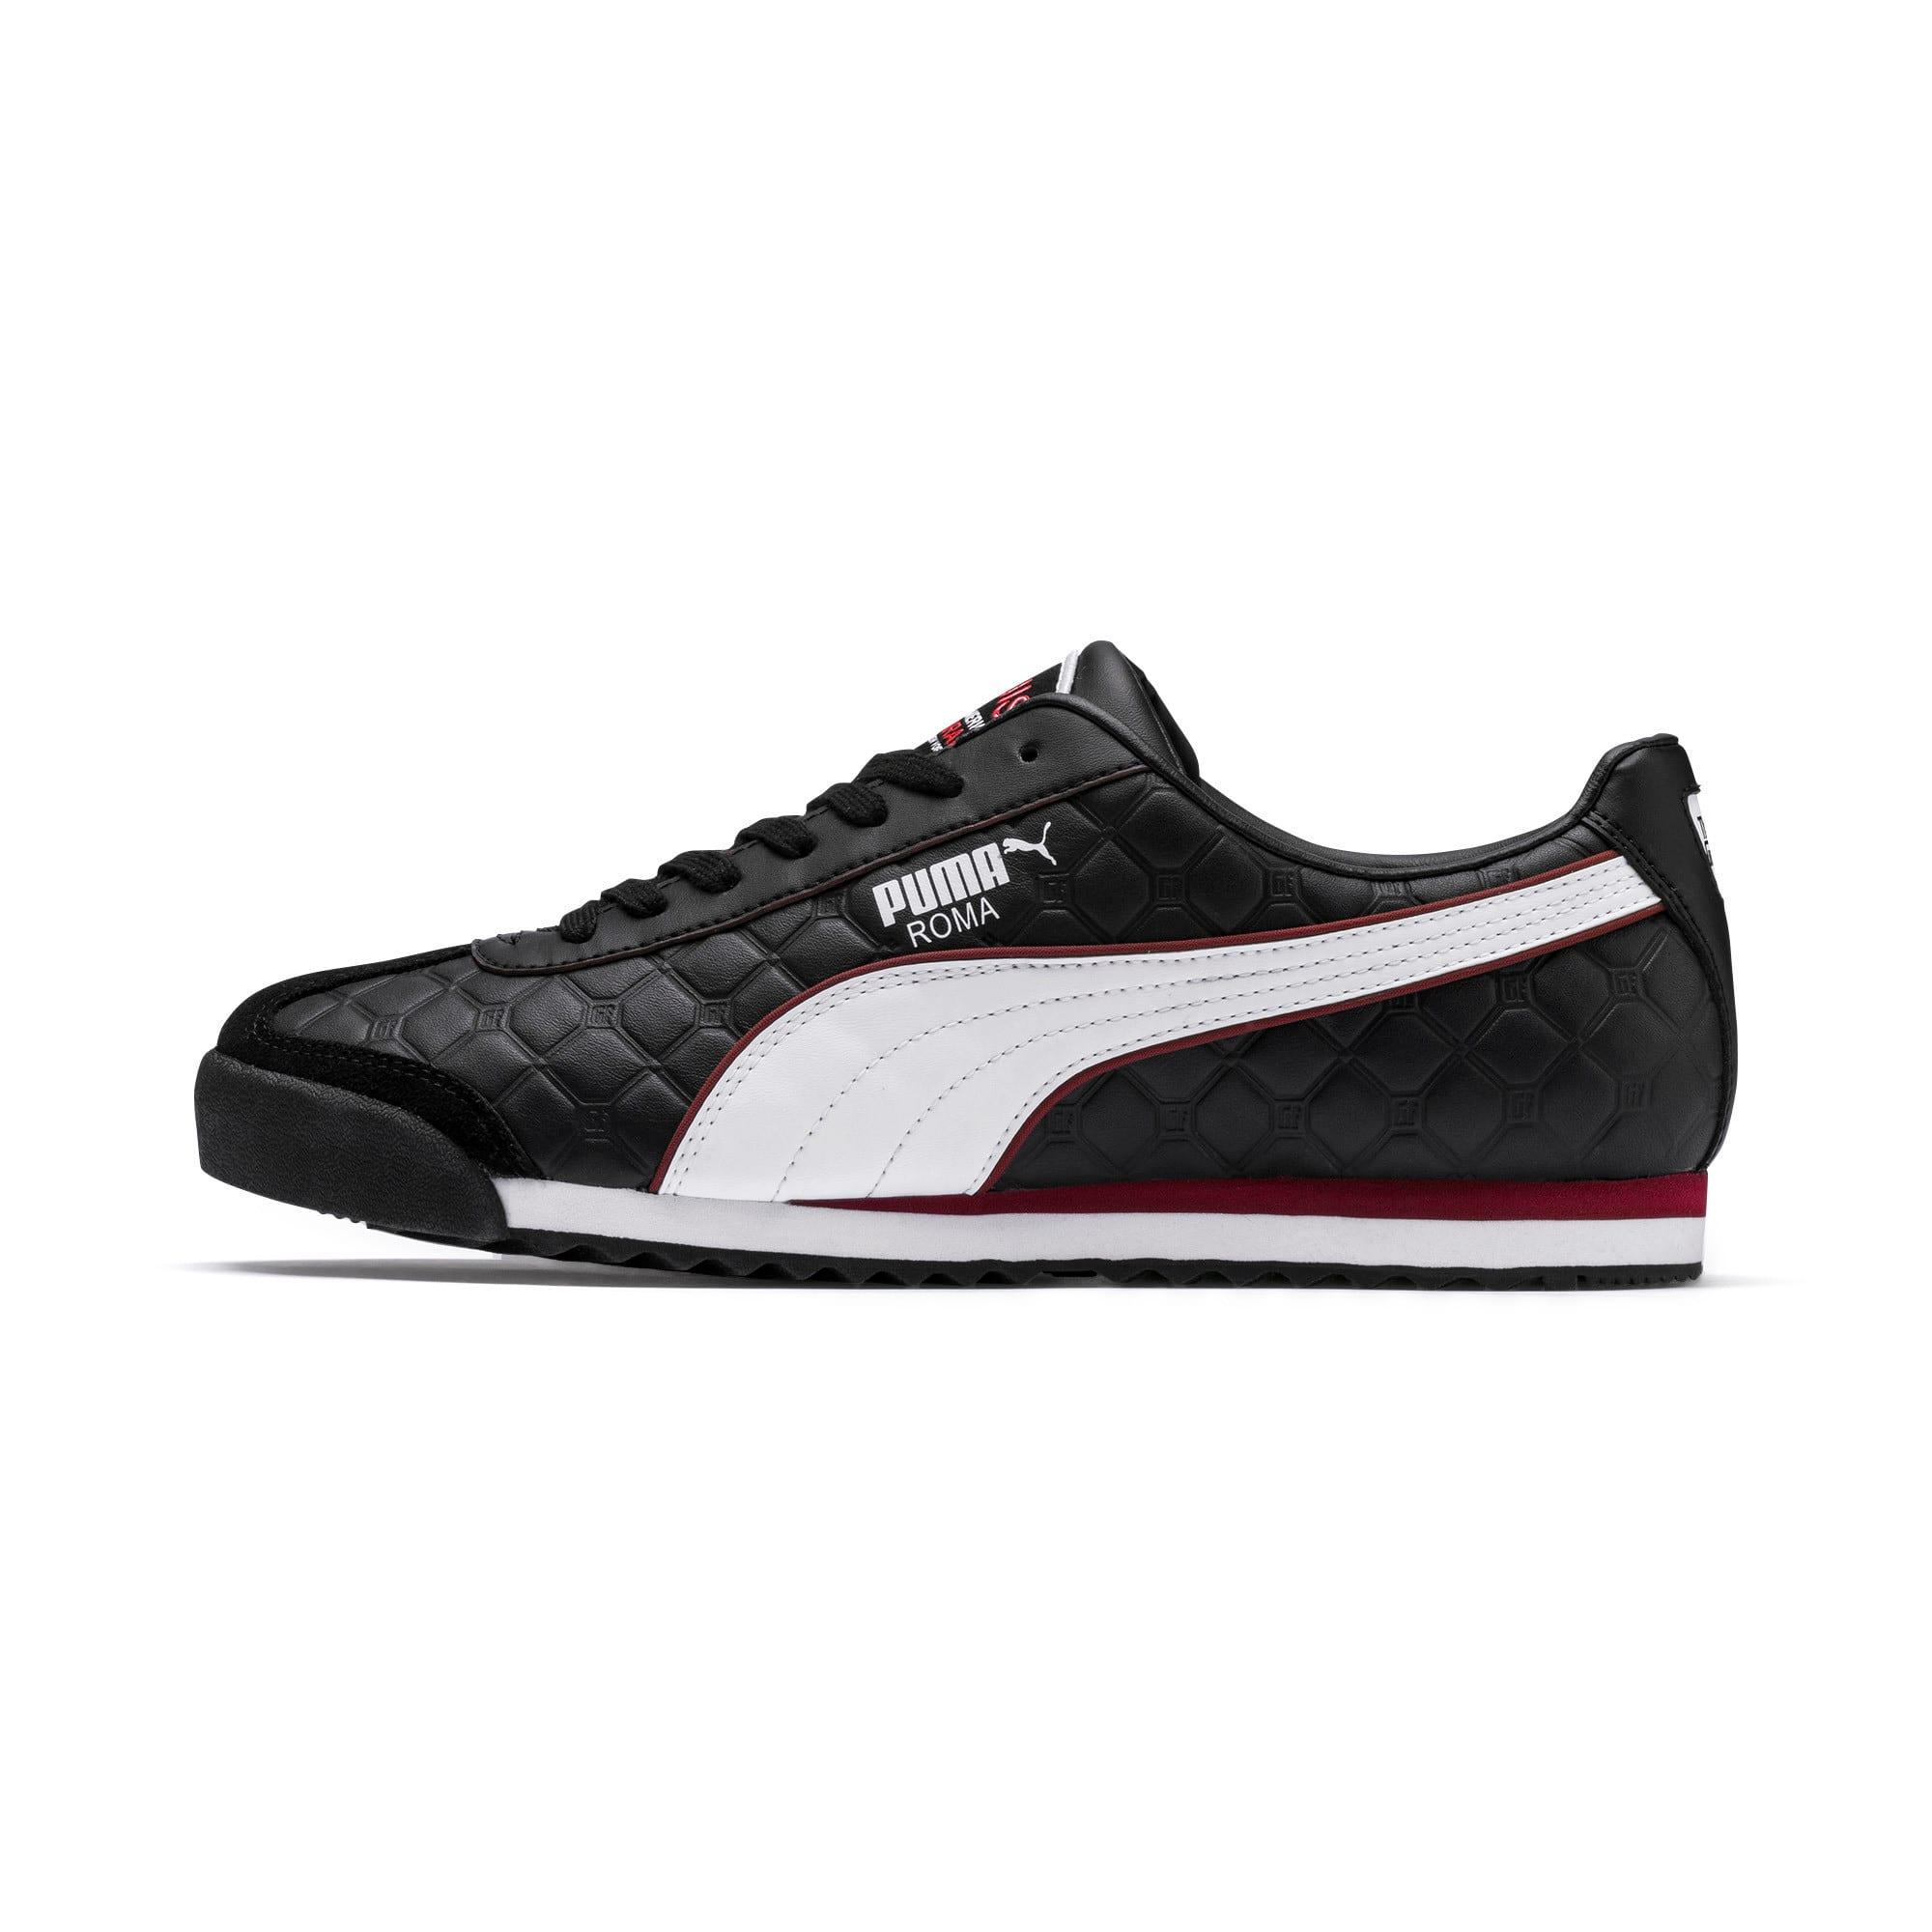 Miniatura 1 de Zapatos deportivos PUMA x THE GODFATHER Roma Louis, Puma Black-Fired Brick, mediano